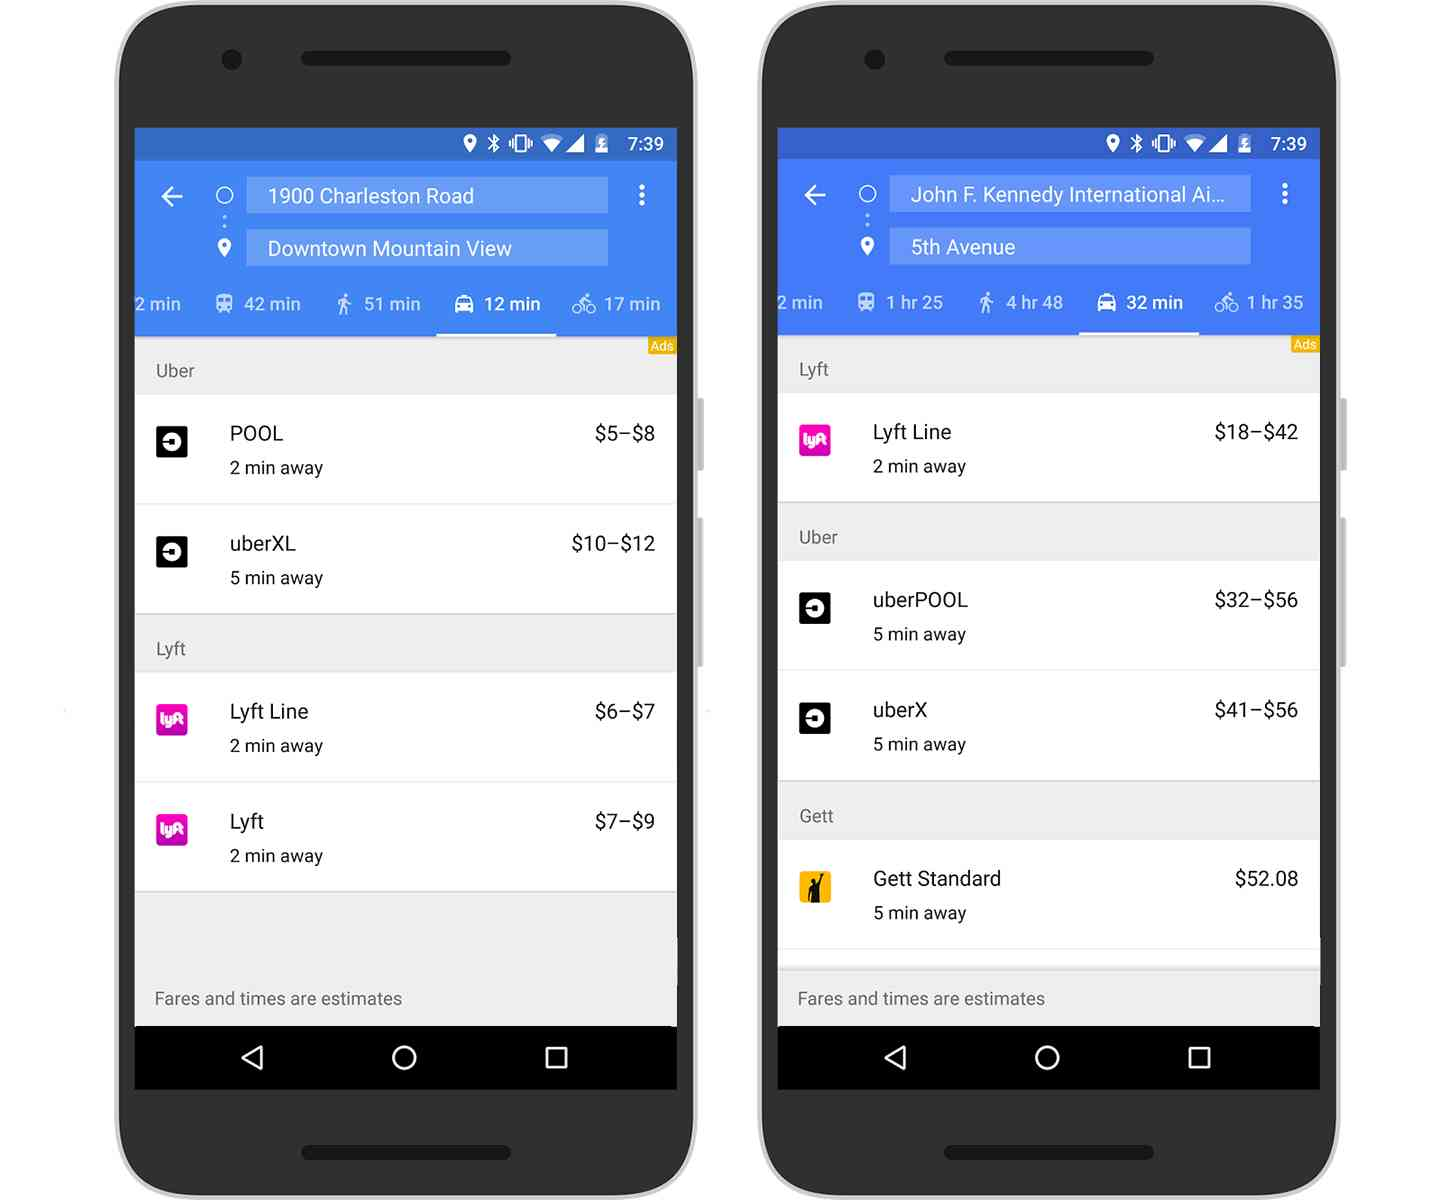 Google Maps ride-sharing services tab Lyft, Gett